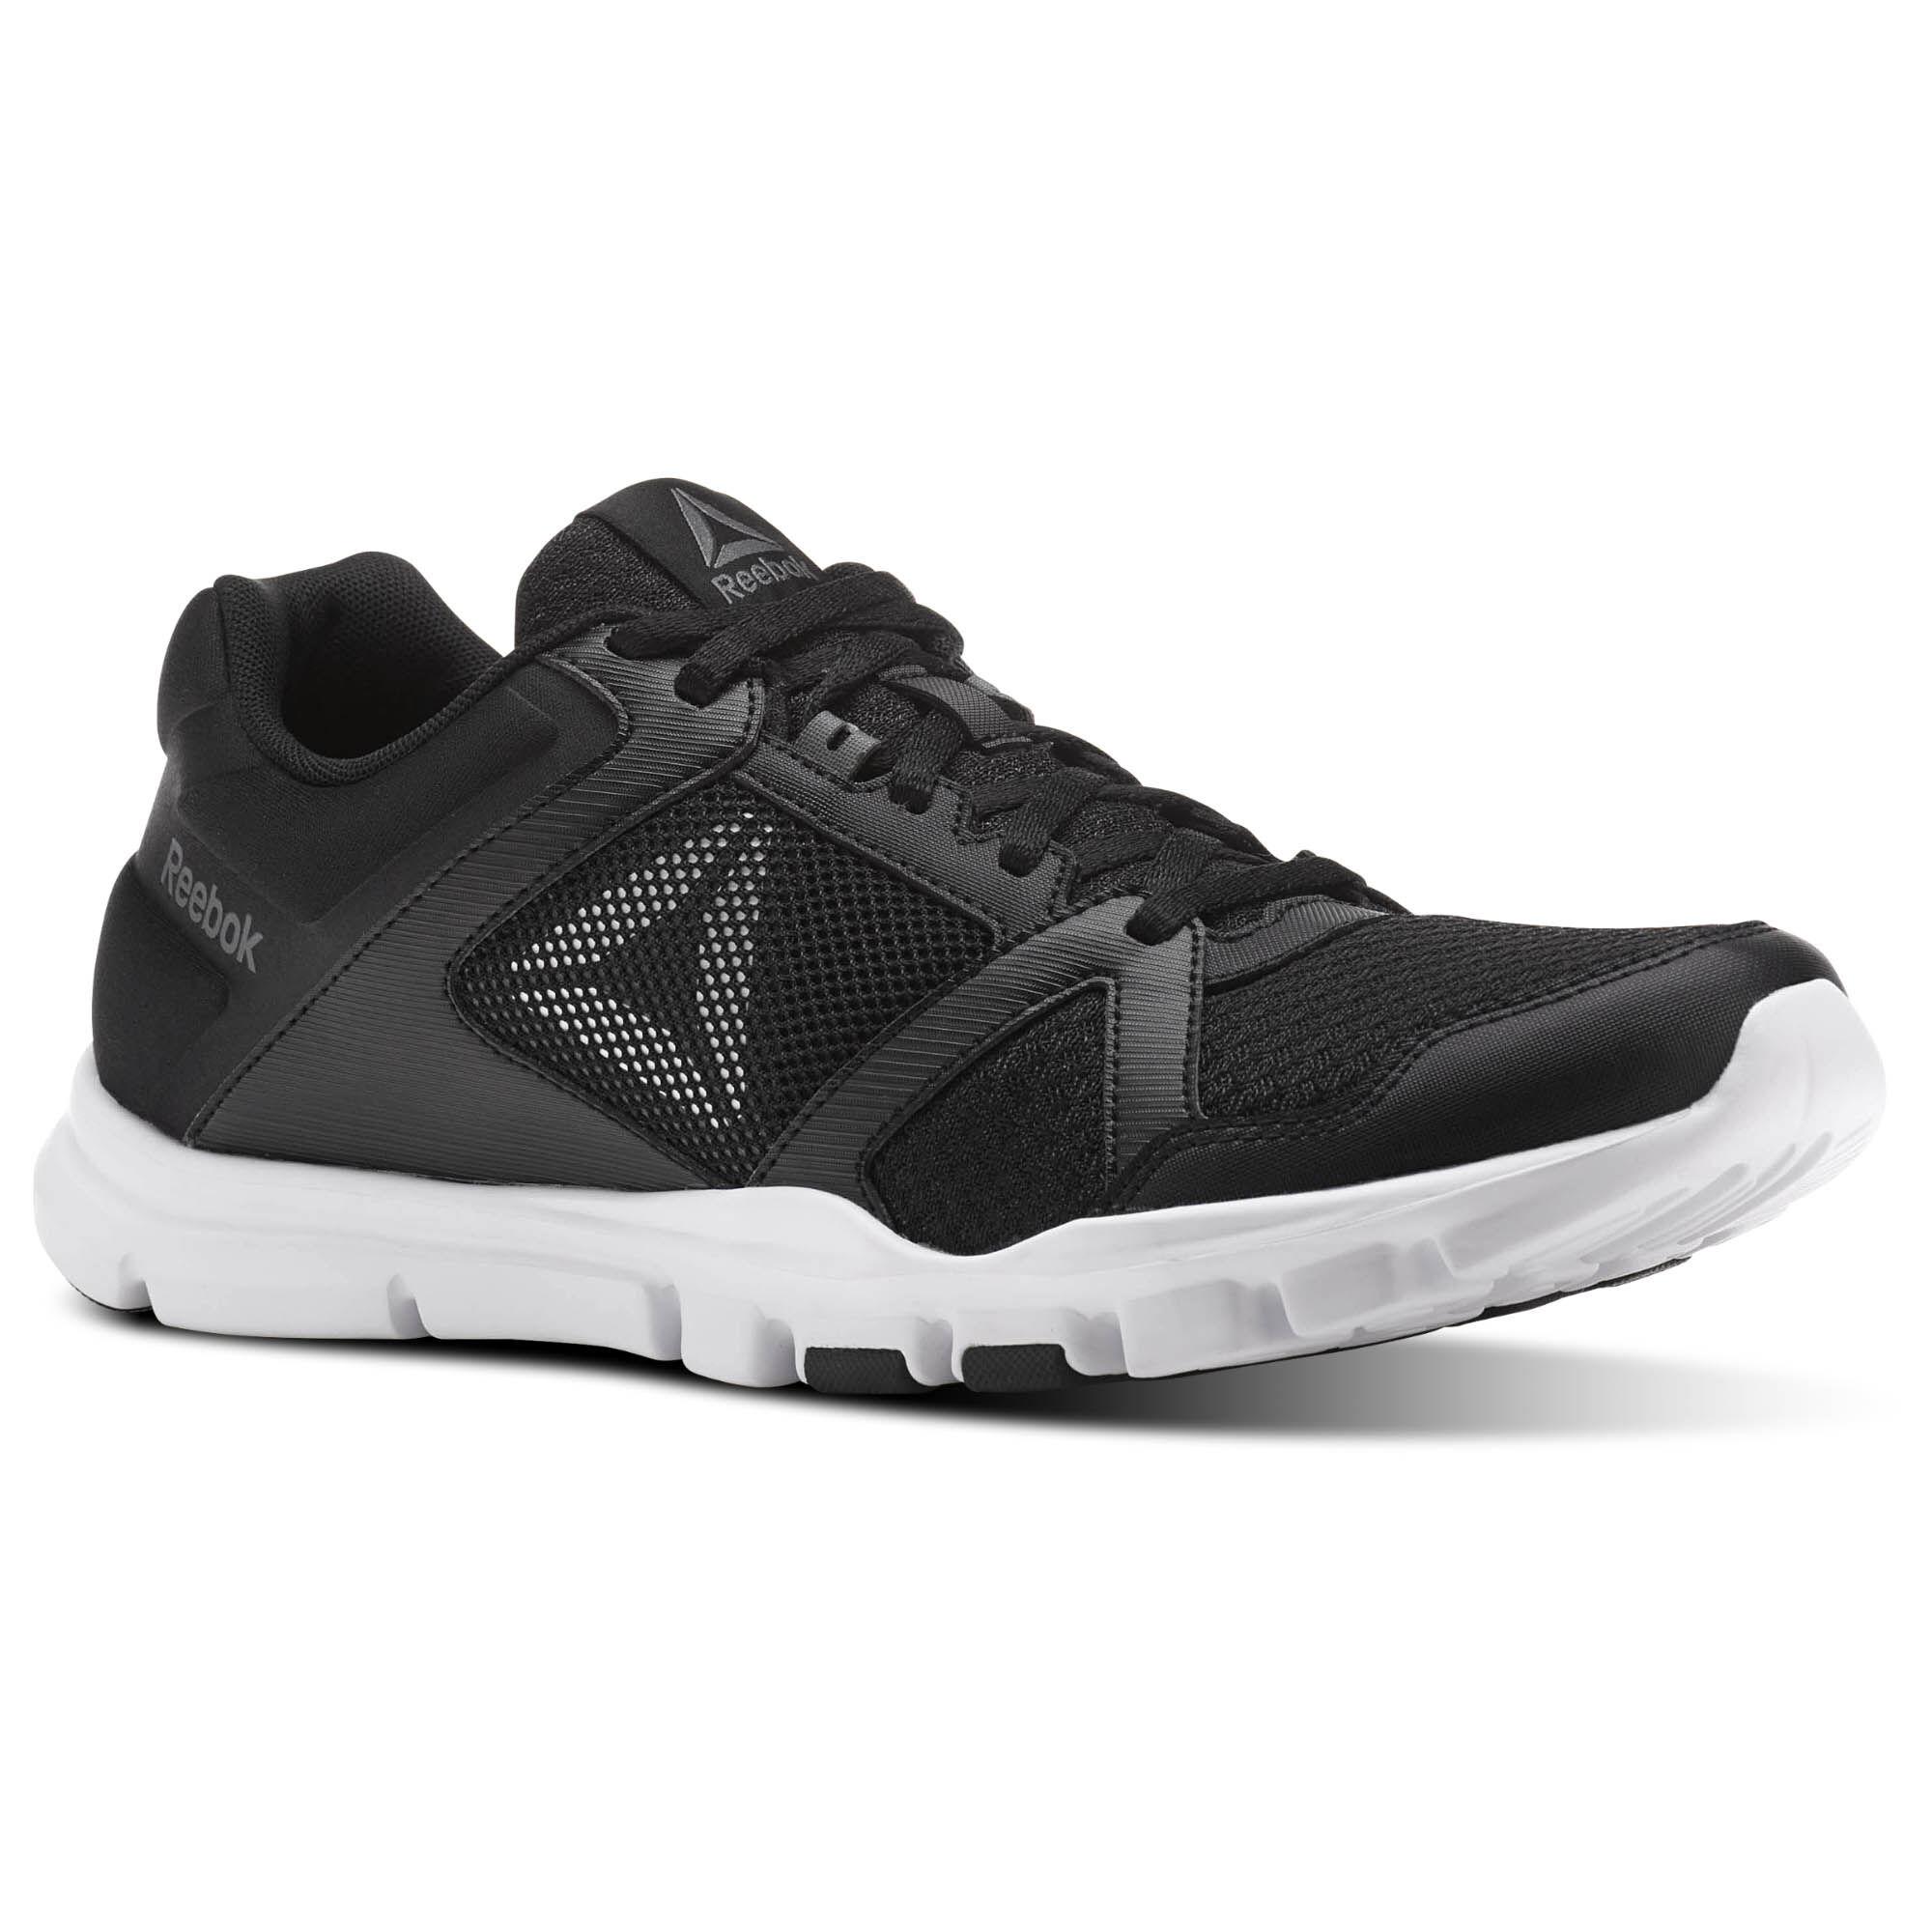 Schuhe Reebok - Yourflex Train 10 Mt BS9884 Black/White/Alloy tl9Vt0m